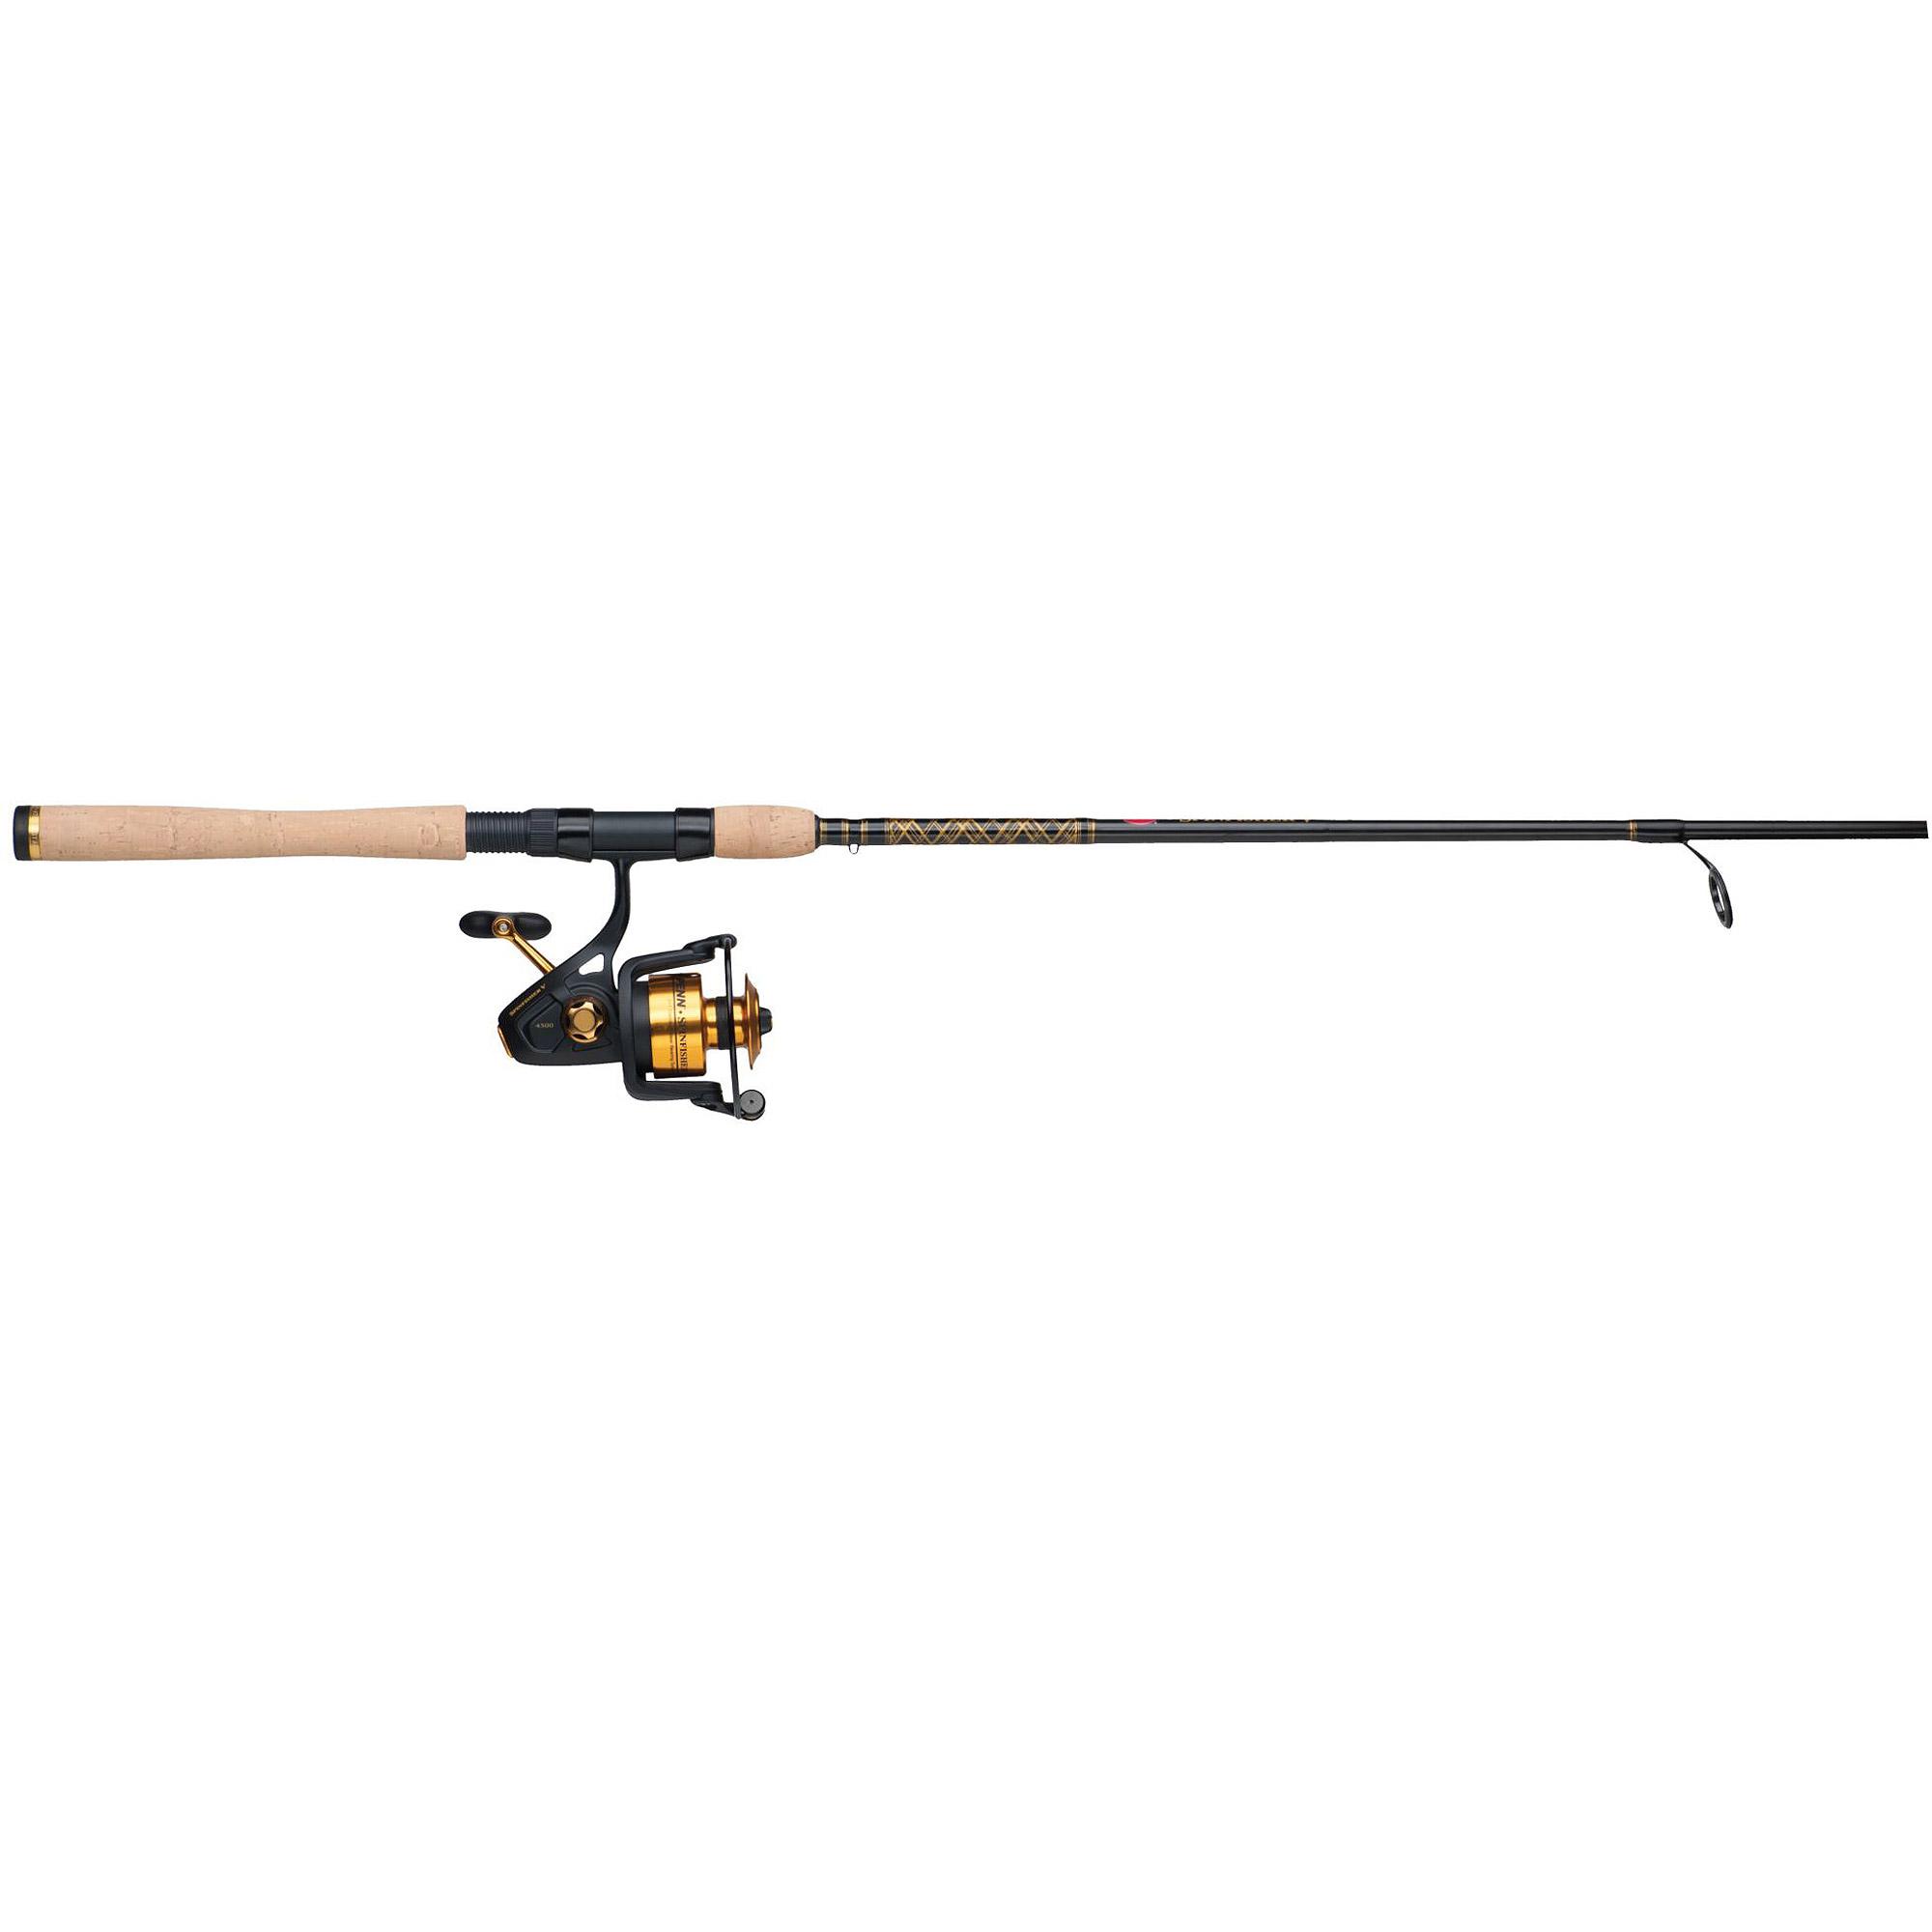 PENN Spinfisher V Combo [4500- Medium- 7'- 1pc]  Walmart.com + Free Shipping $77.06